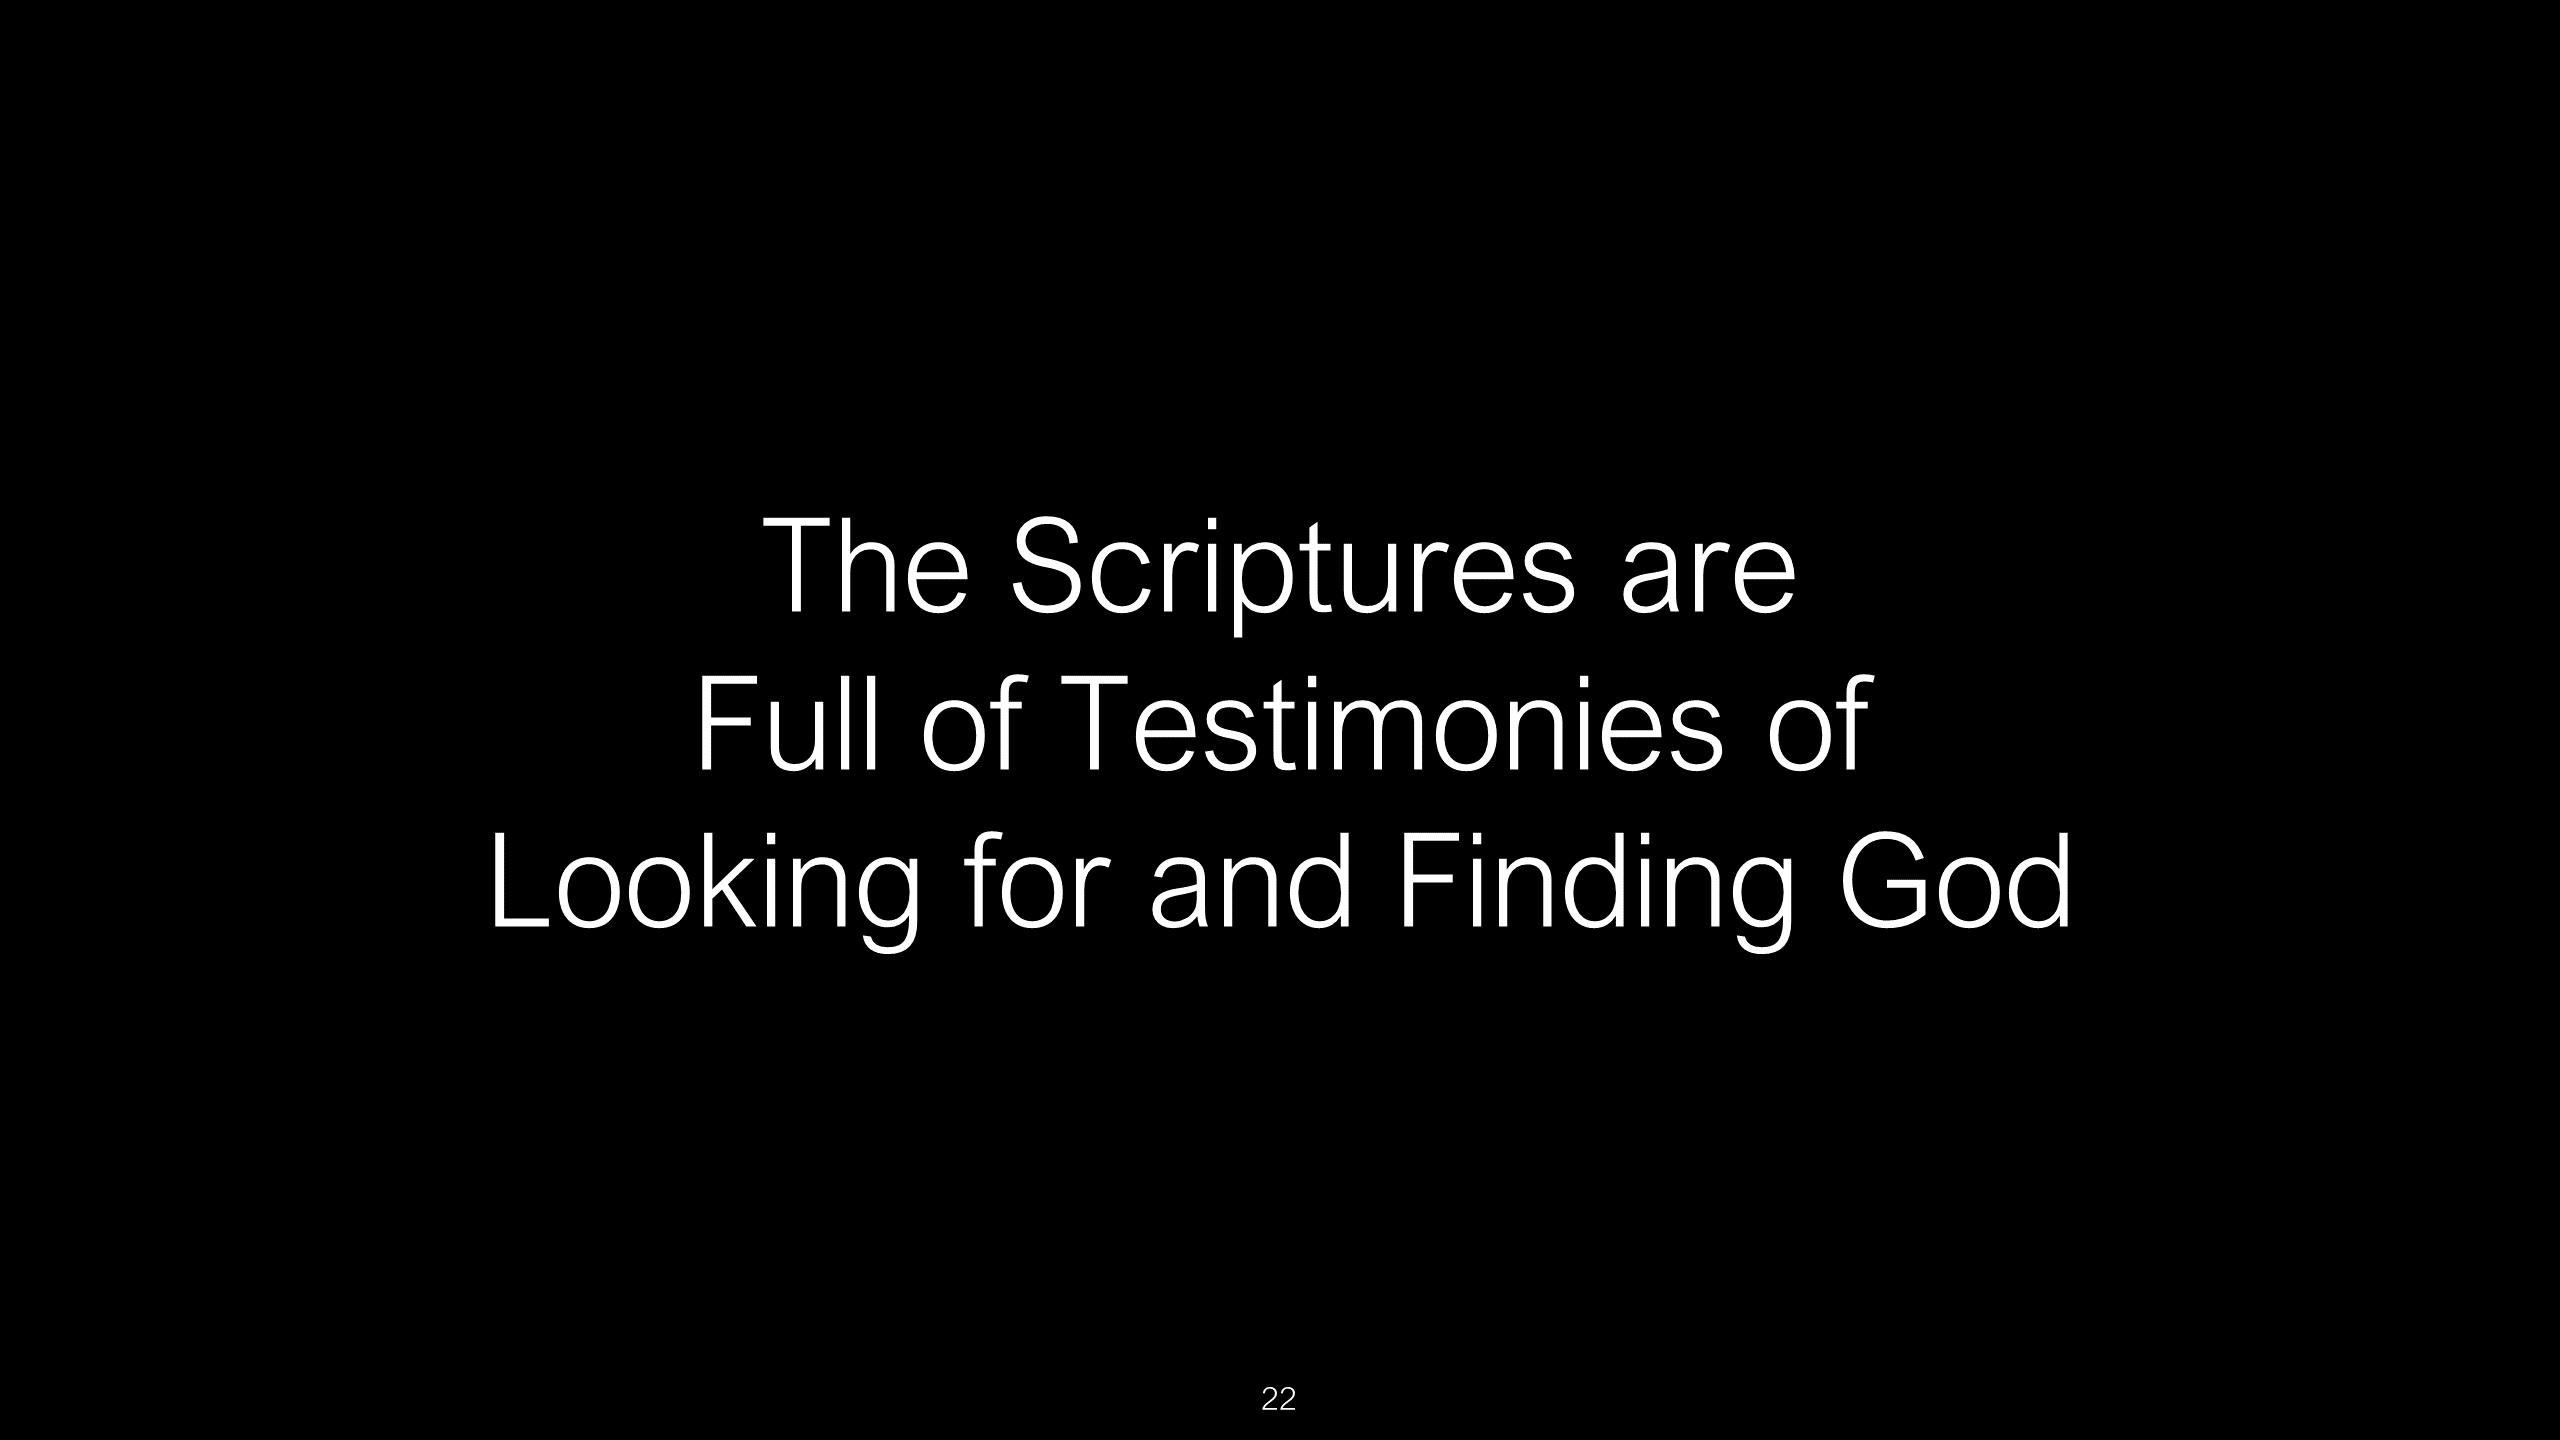 SWS-08 - Temptations, God's Faithfulness, & Satan's Ancient Playbook (22)